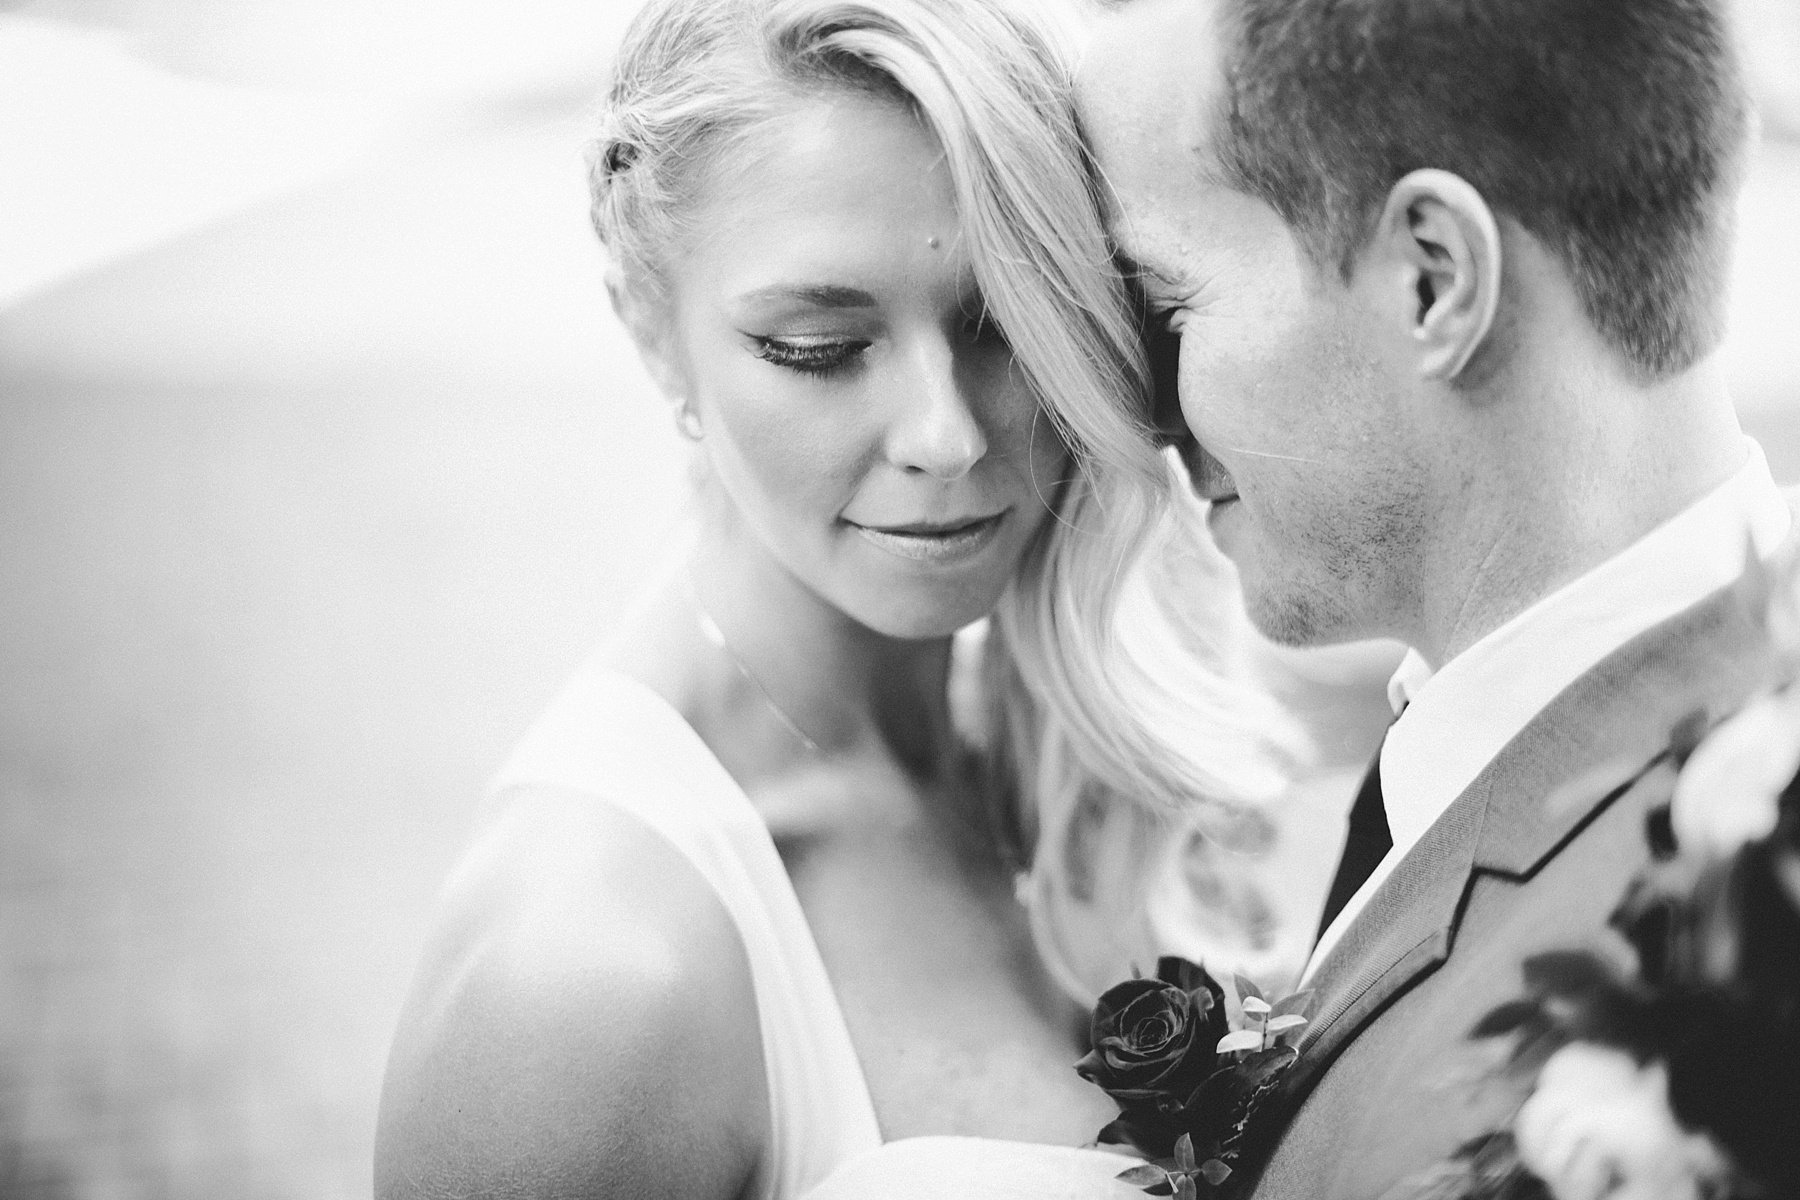 nj-monmouth-county-wedding-photographer-long-branch_0017.jpg